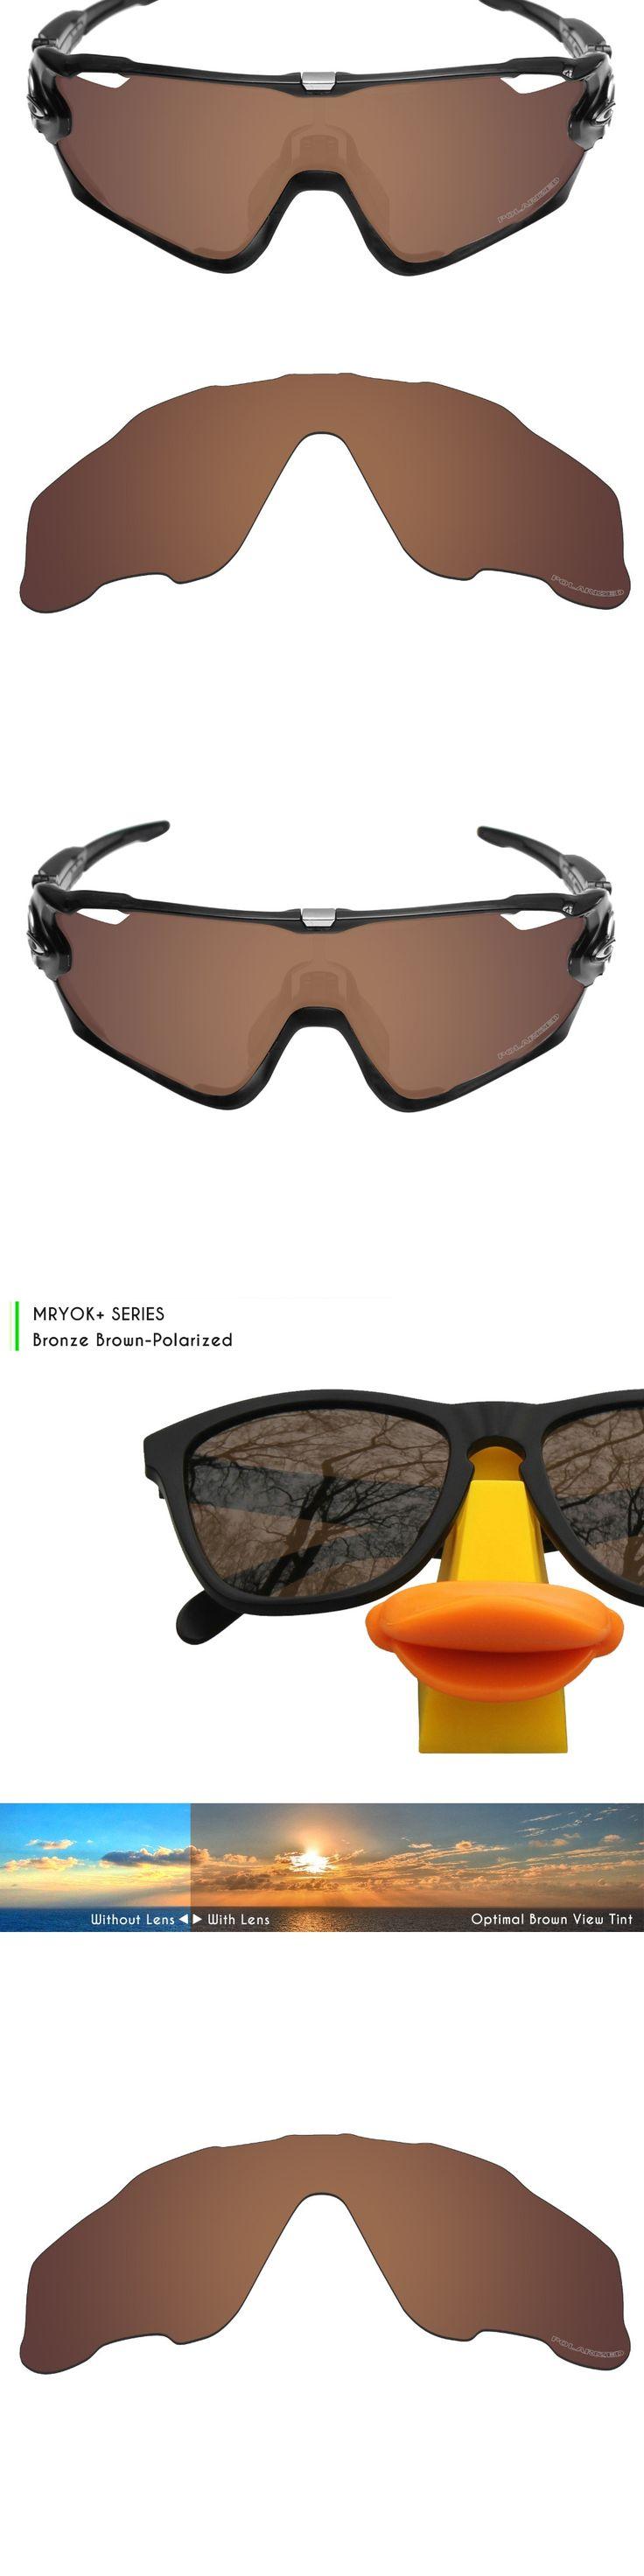 Mryok+ POLARIZED Resist SeaWater Replacement Lenses for Oakley Jawbreaker Sunglasses Bronze Brown